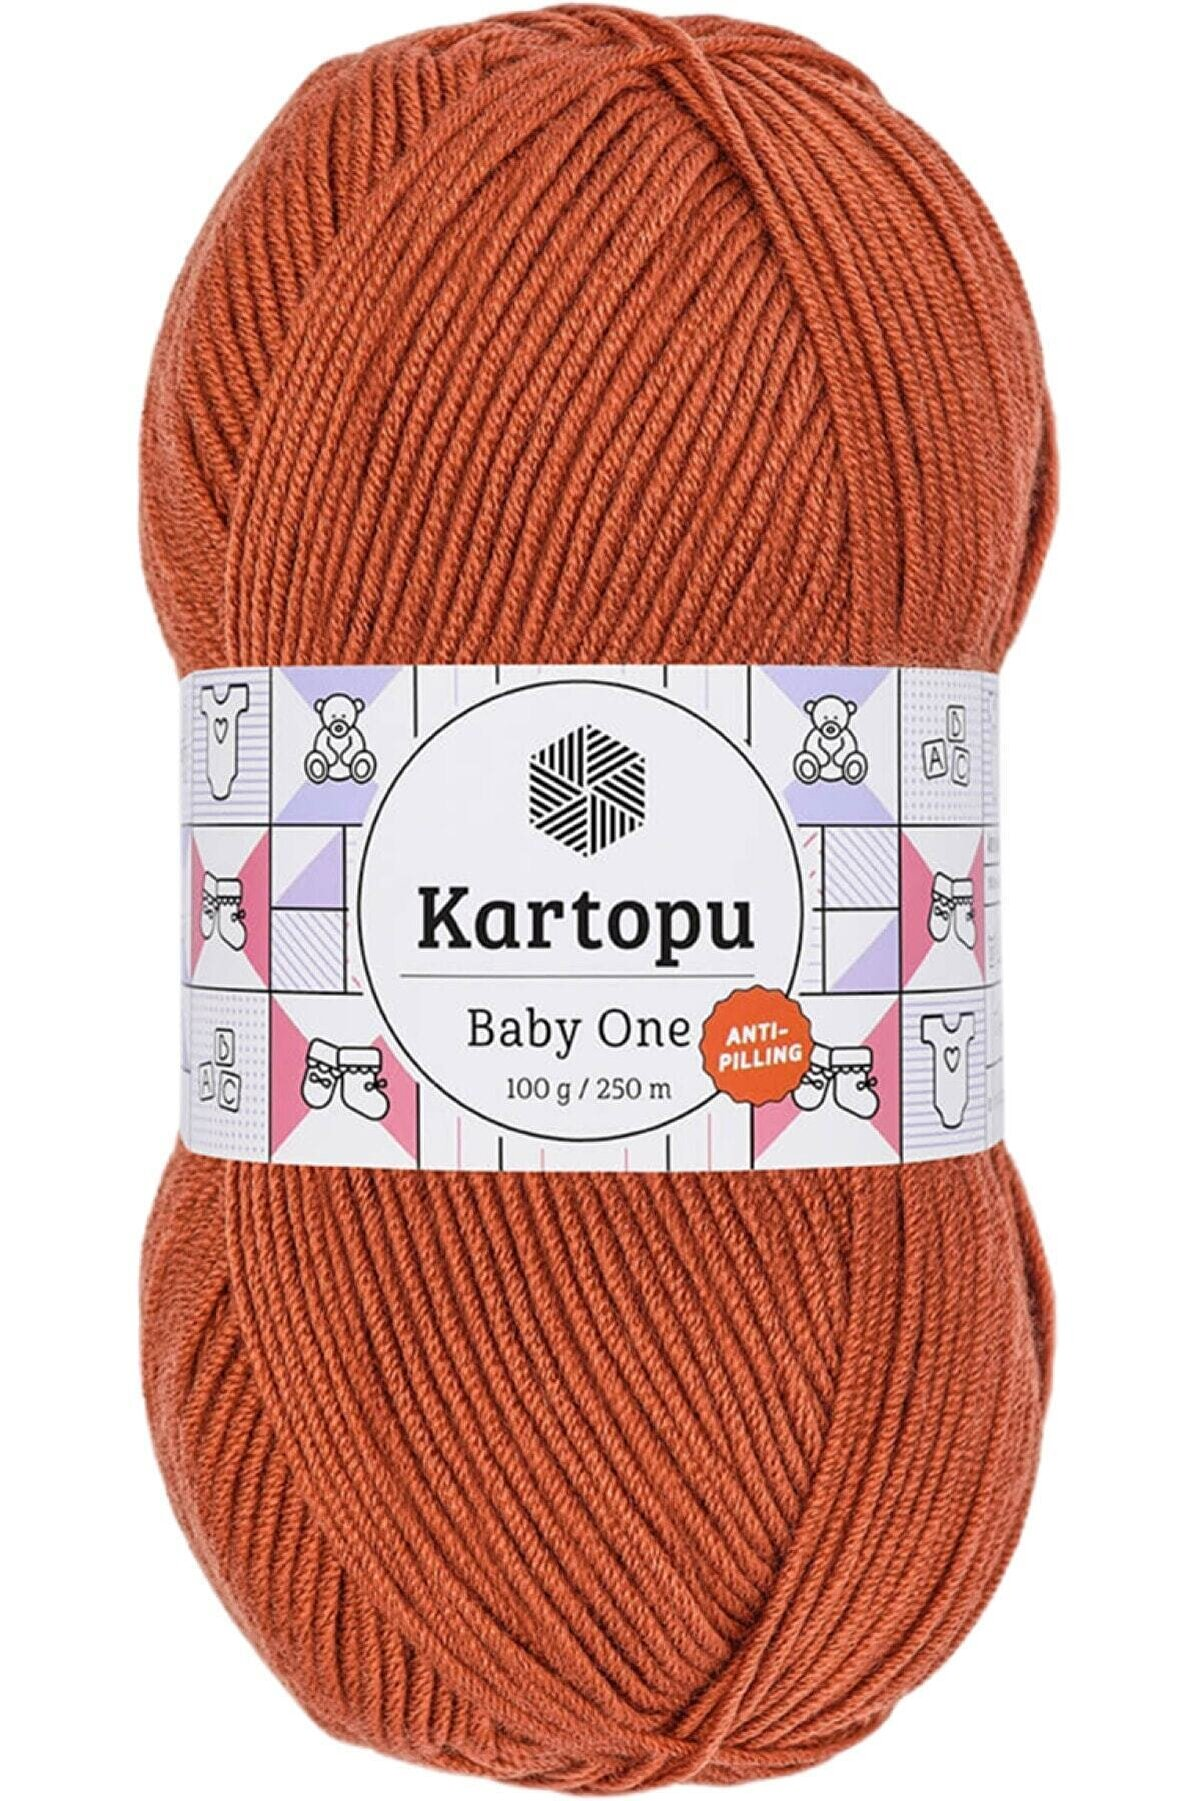 Kartopu Baby One Tüylenmeyen Tarçın Bebek Ipi K1210